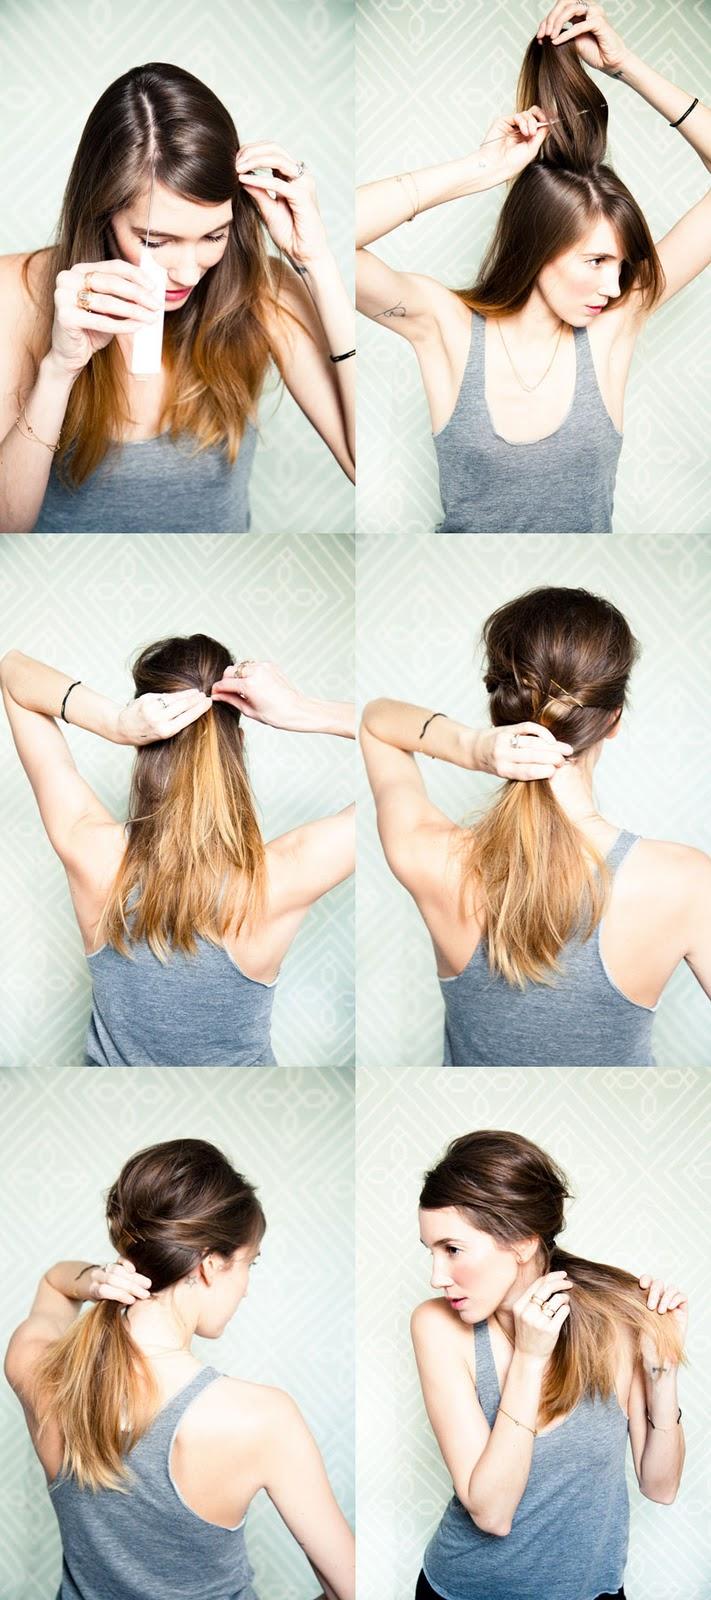 http://3.bp.blogspot.com/_abGRa1b0BJc/TVGhtPd5ICI/AAAAAAAAcAU/gxTCs5r5Jk4/s1600/teased-messy-side-ponytail-hair-how-to.jpg